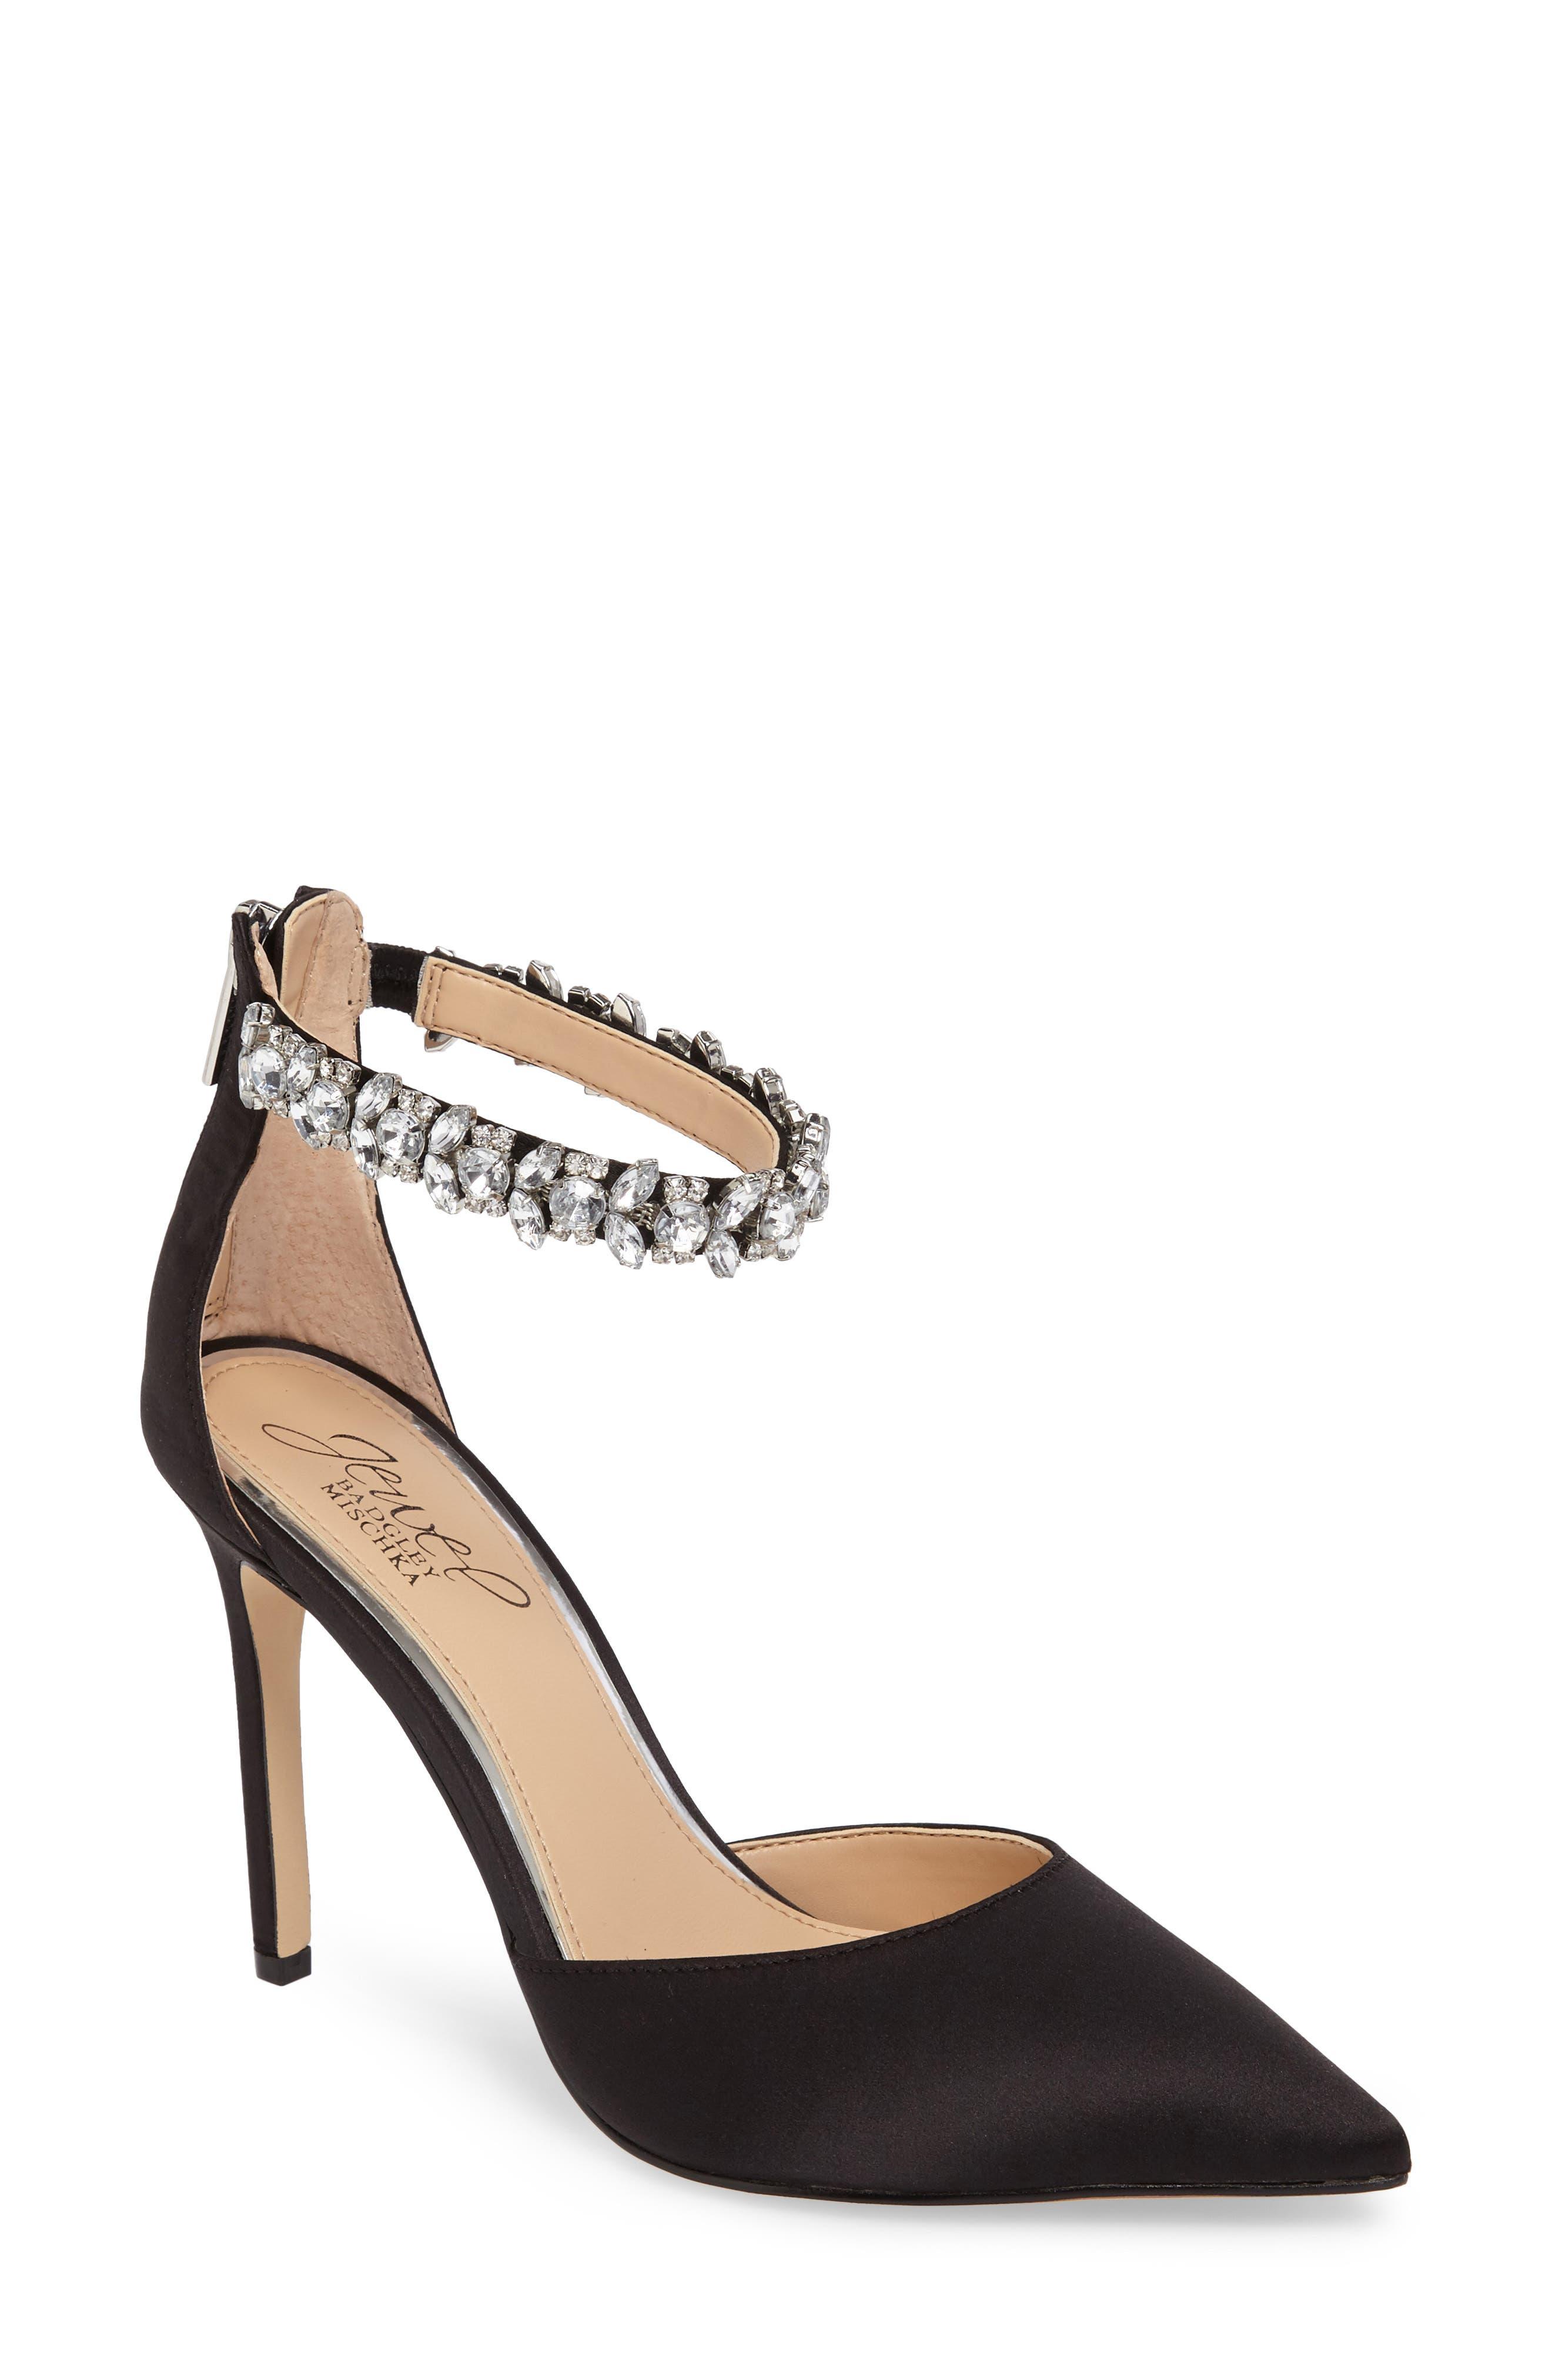 Main Image - Jewel Badgley Mischka Lizbeth Ankle Strap Pump (Women)